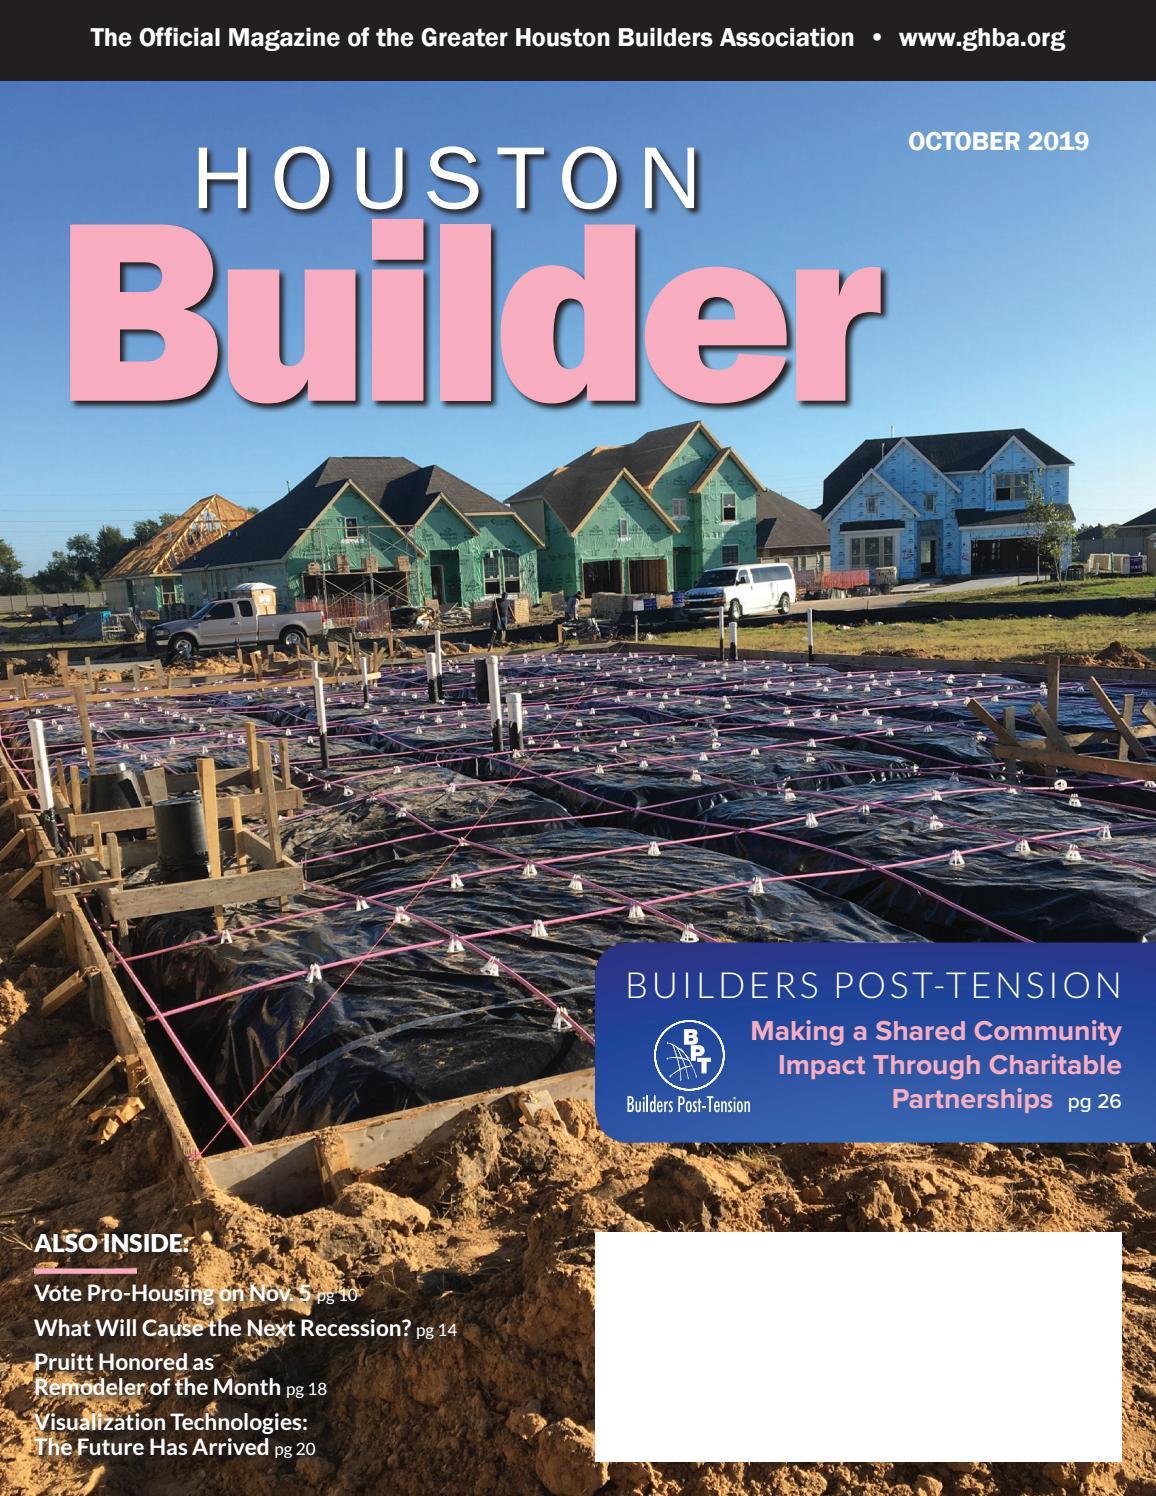 2 10 Home Warranty Brochure 2020.Houston Builder October 2019 By Ghba Issuu